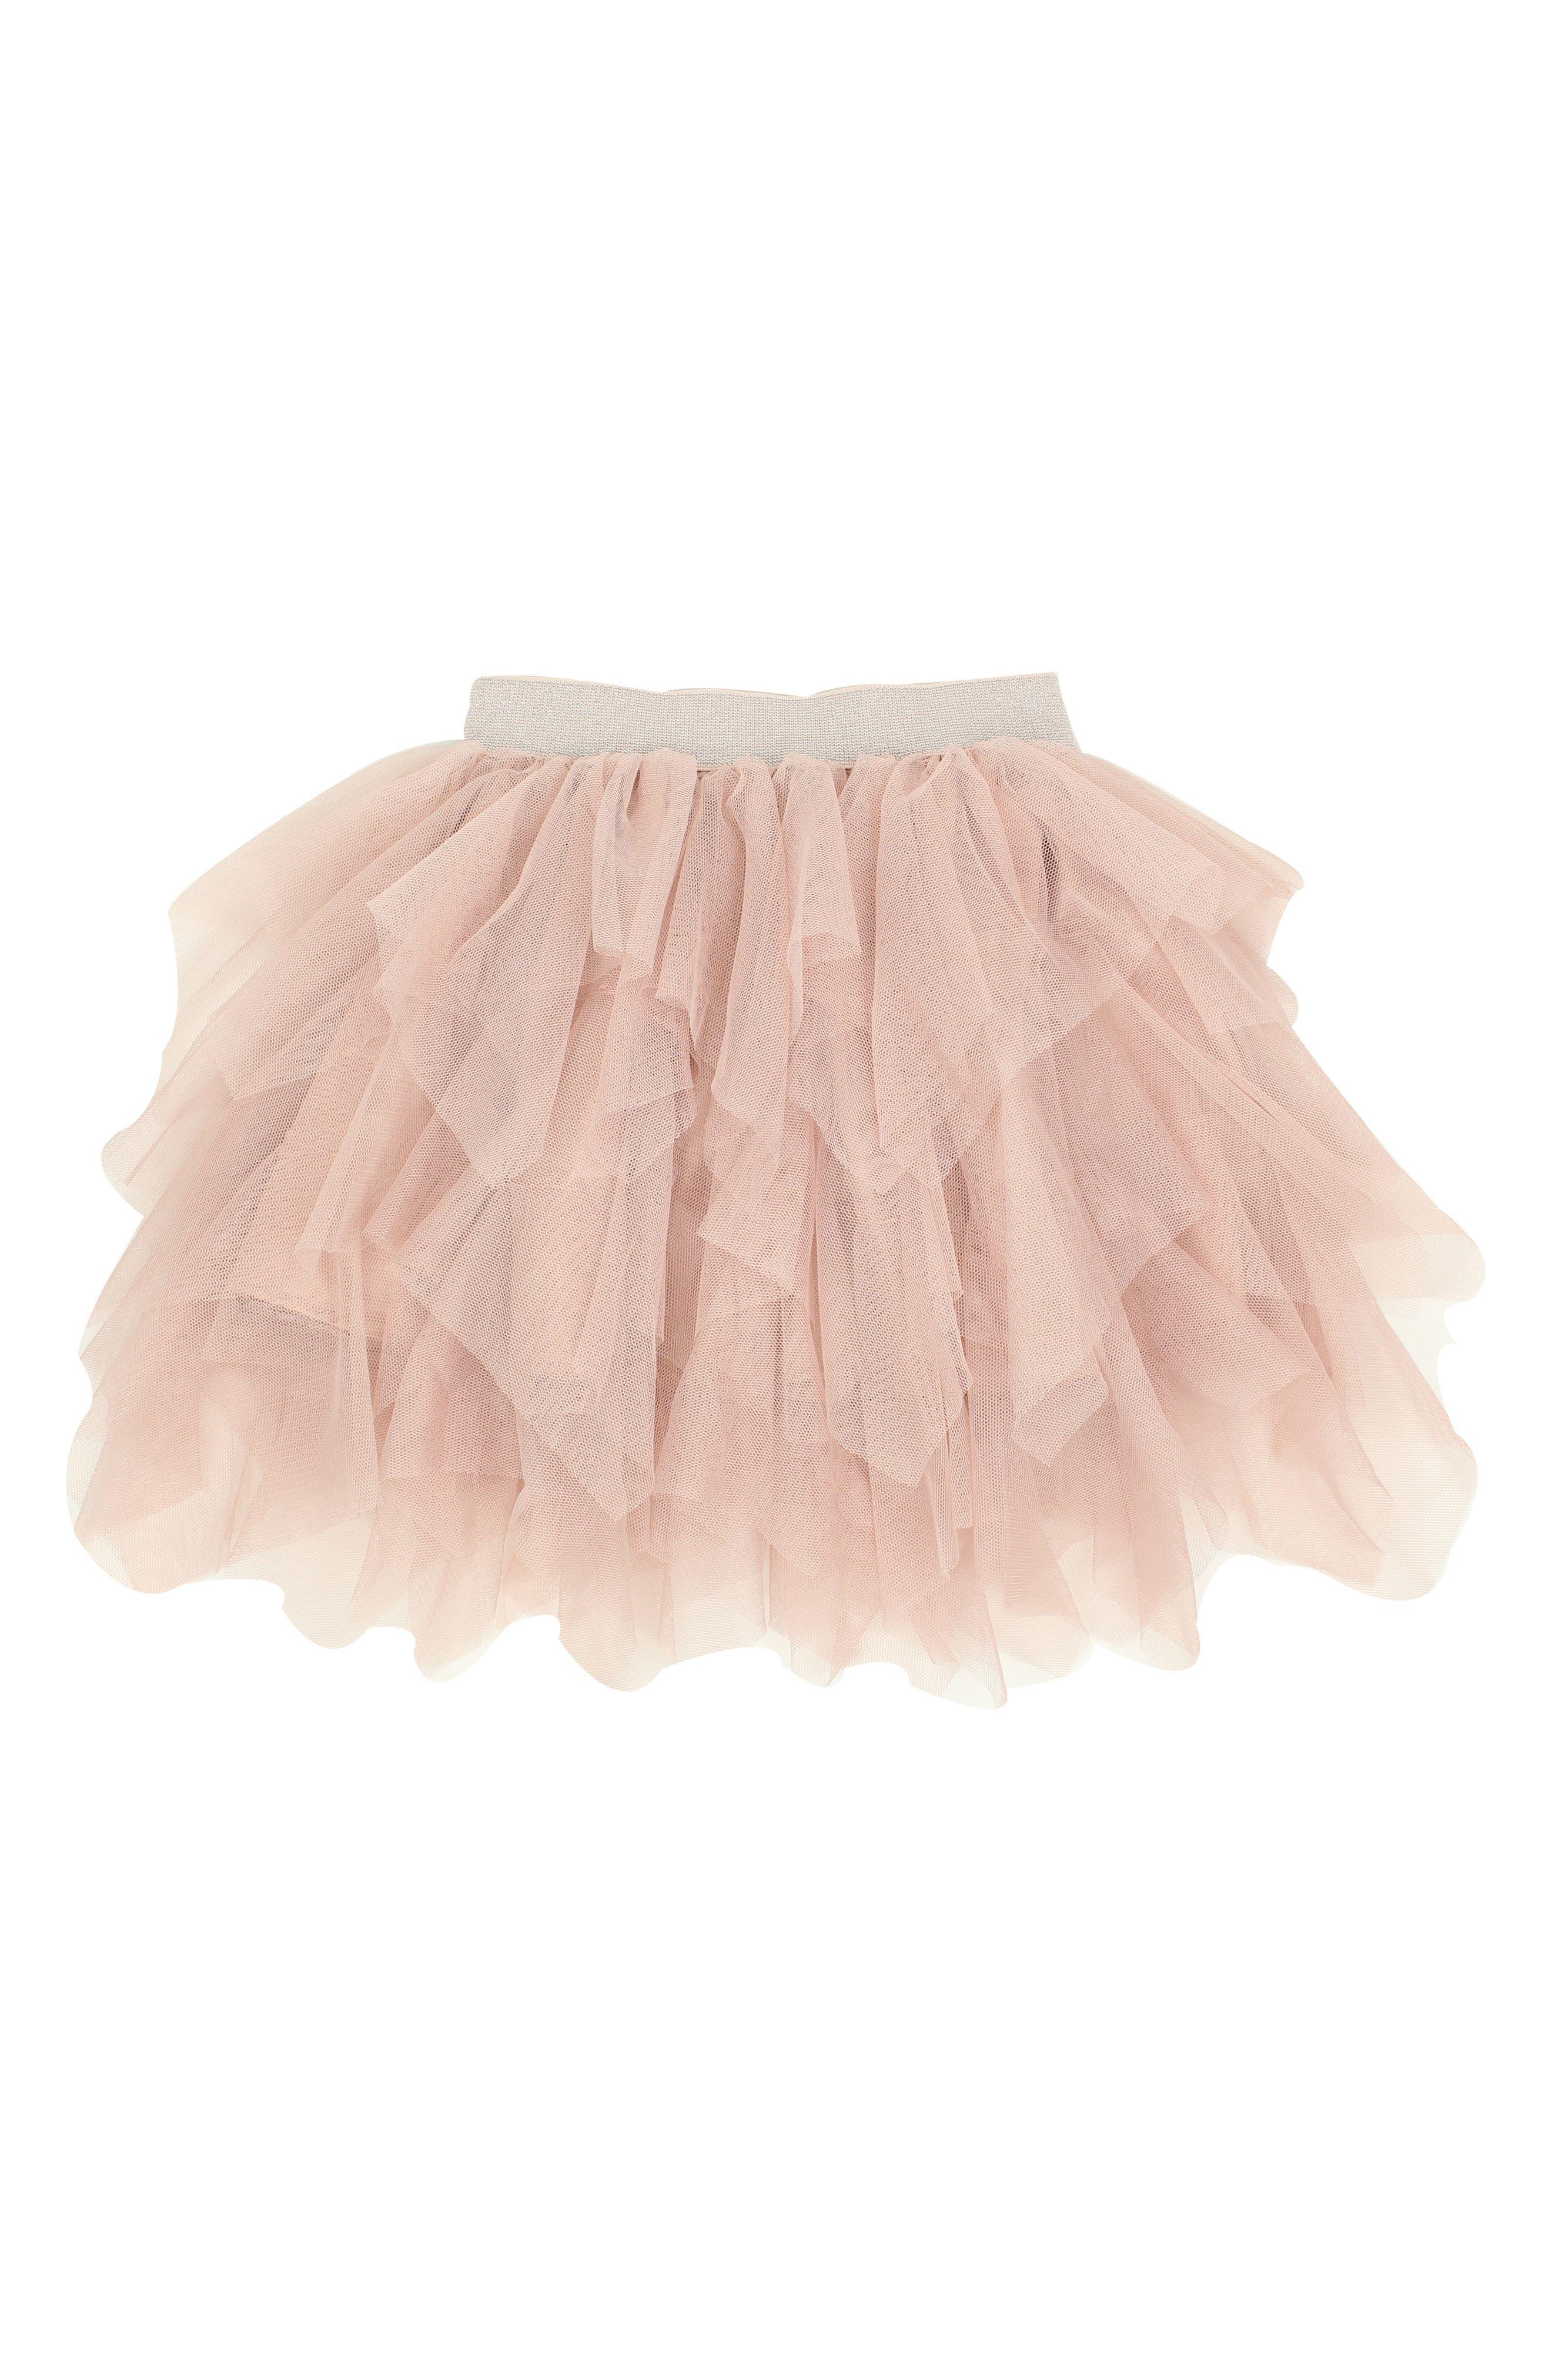 Main Image - Popatu Tiered Tulle Skirt (Toddler Girls & Little Girls)